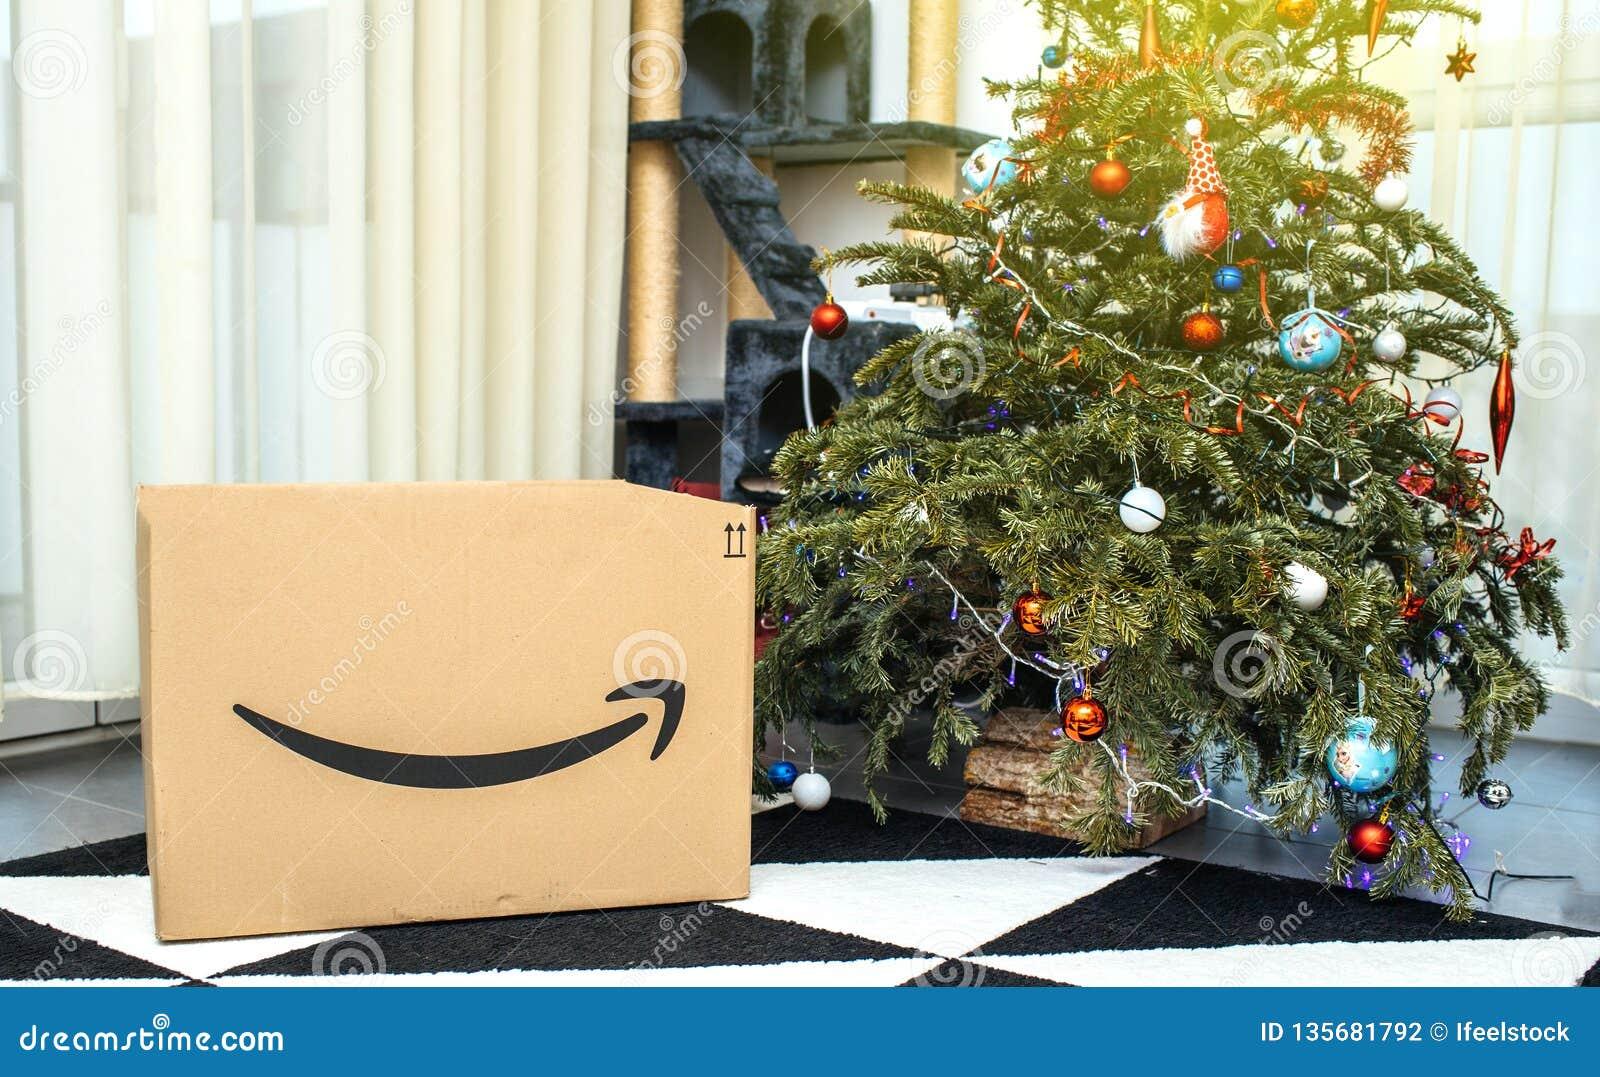 Amazon Cardboard Box Near Christmas Tree In The Living Room